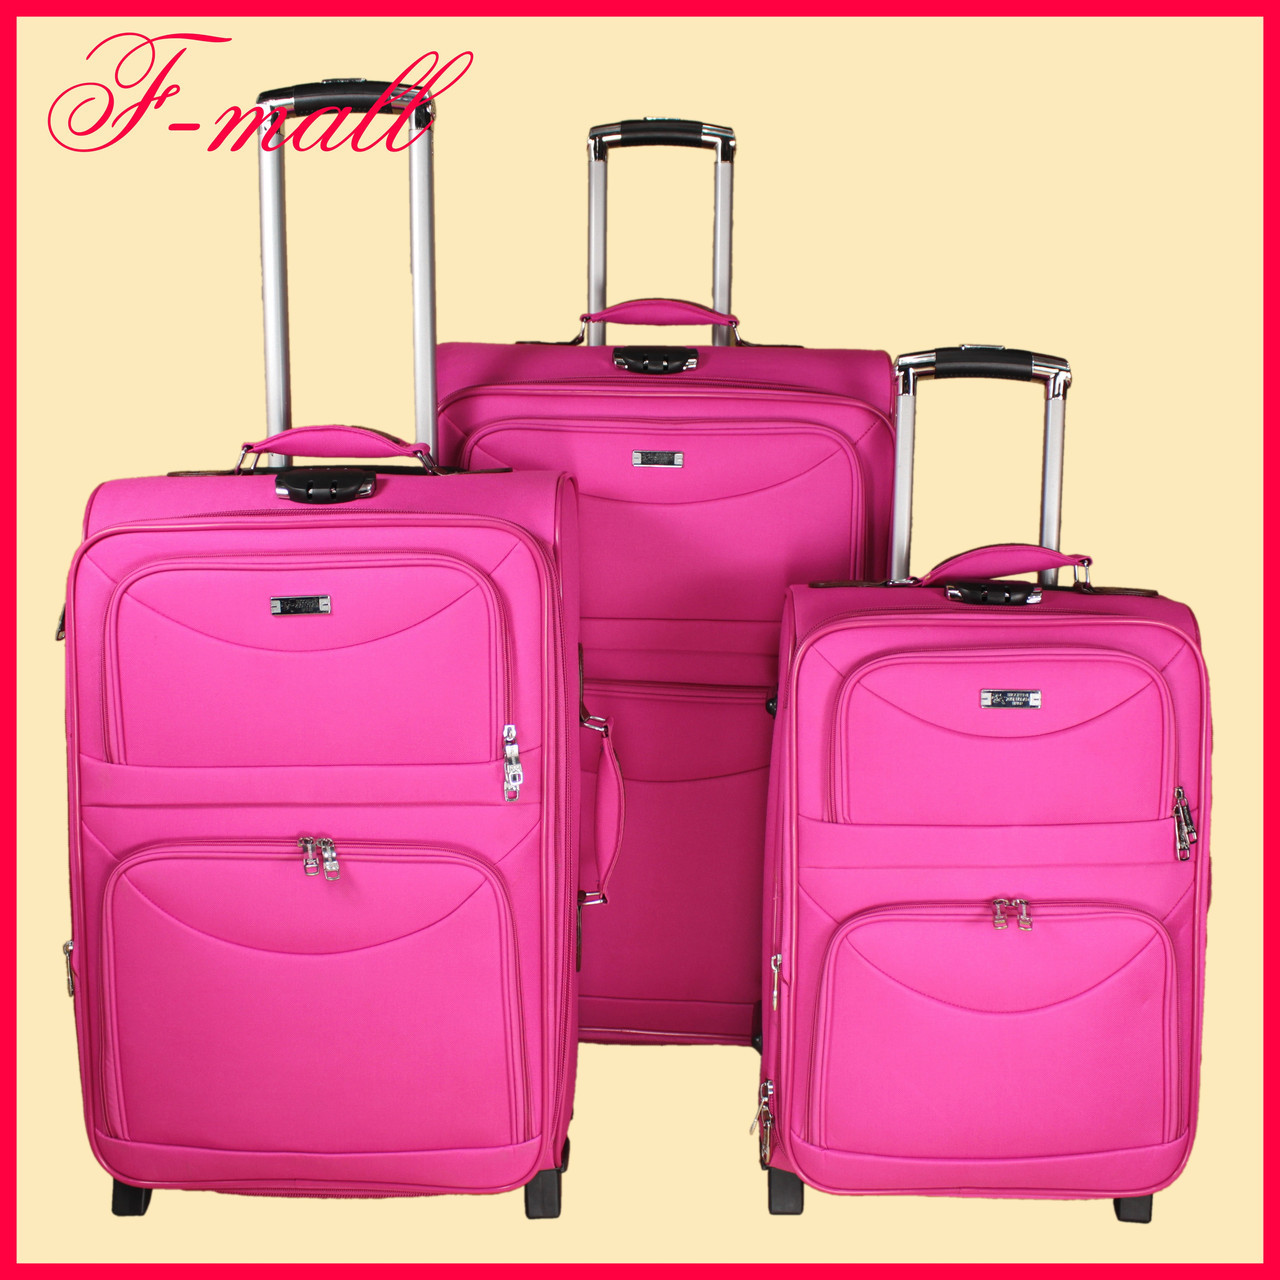 Комплект чемоданов Union